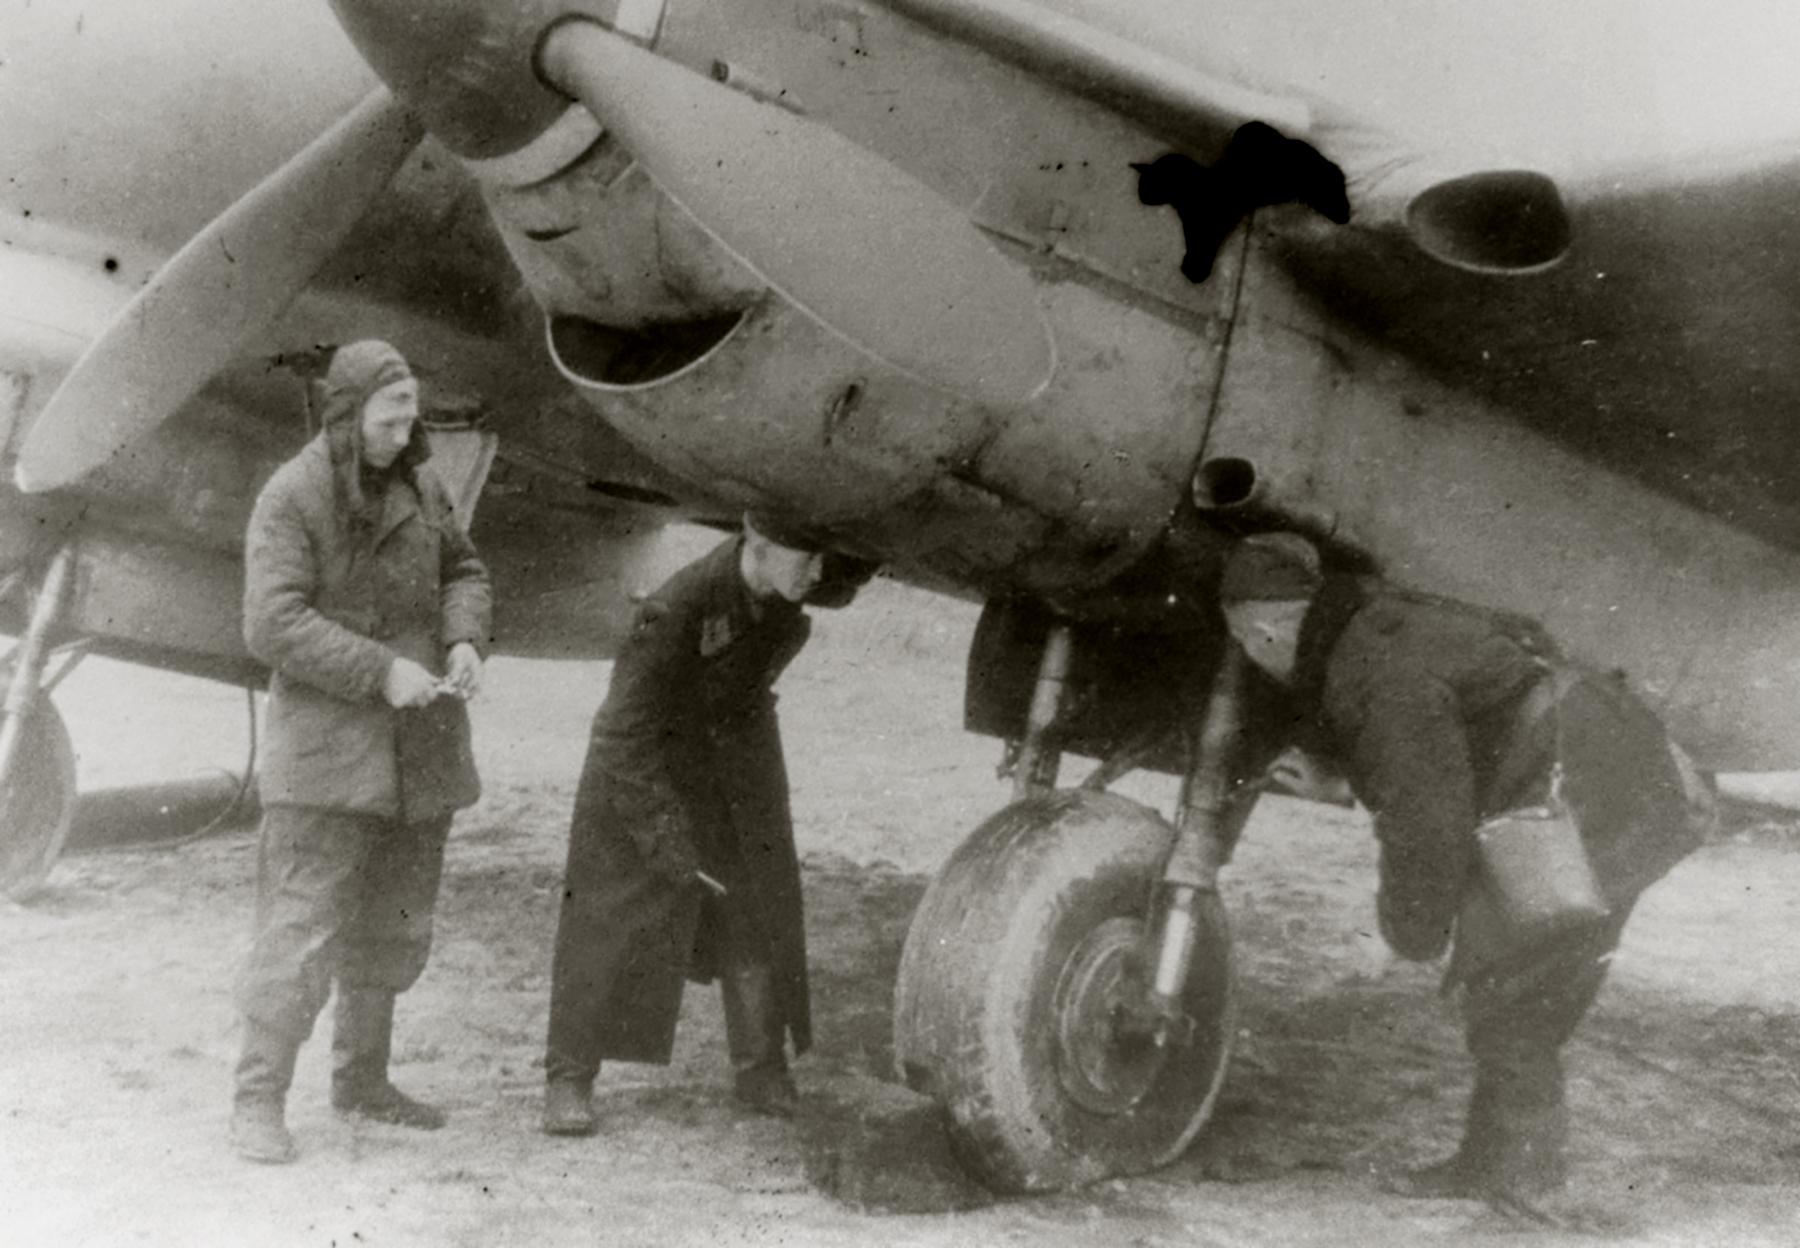 Petlyakov Pe 2 48GAPDr aircraft having its landing gear inspected 01